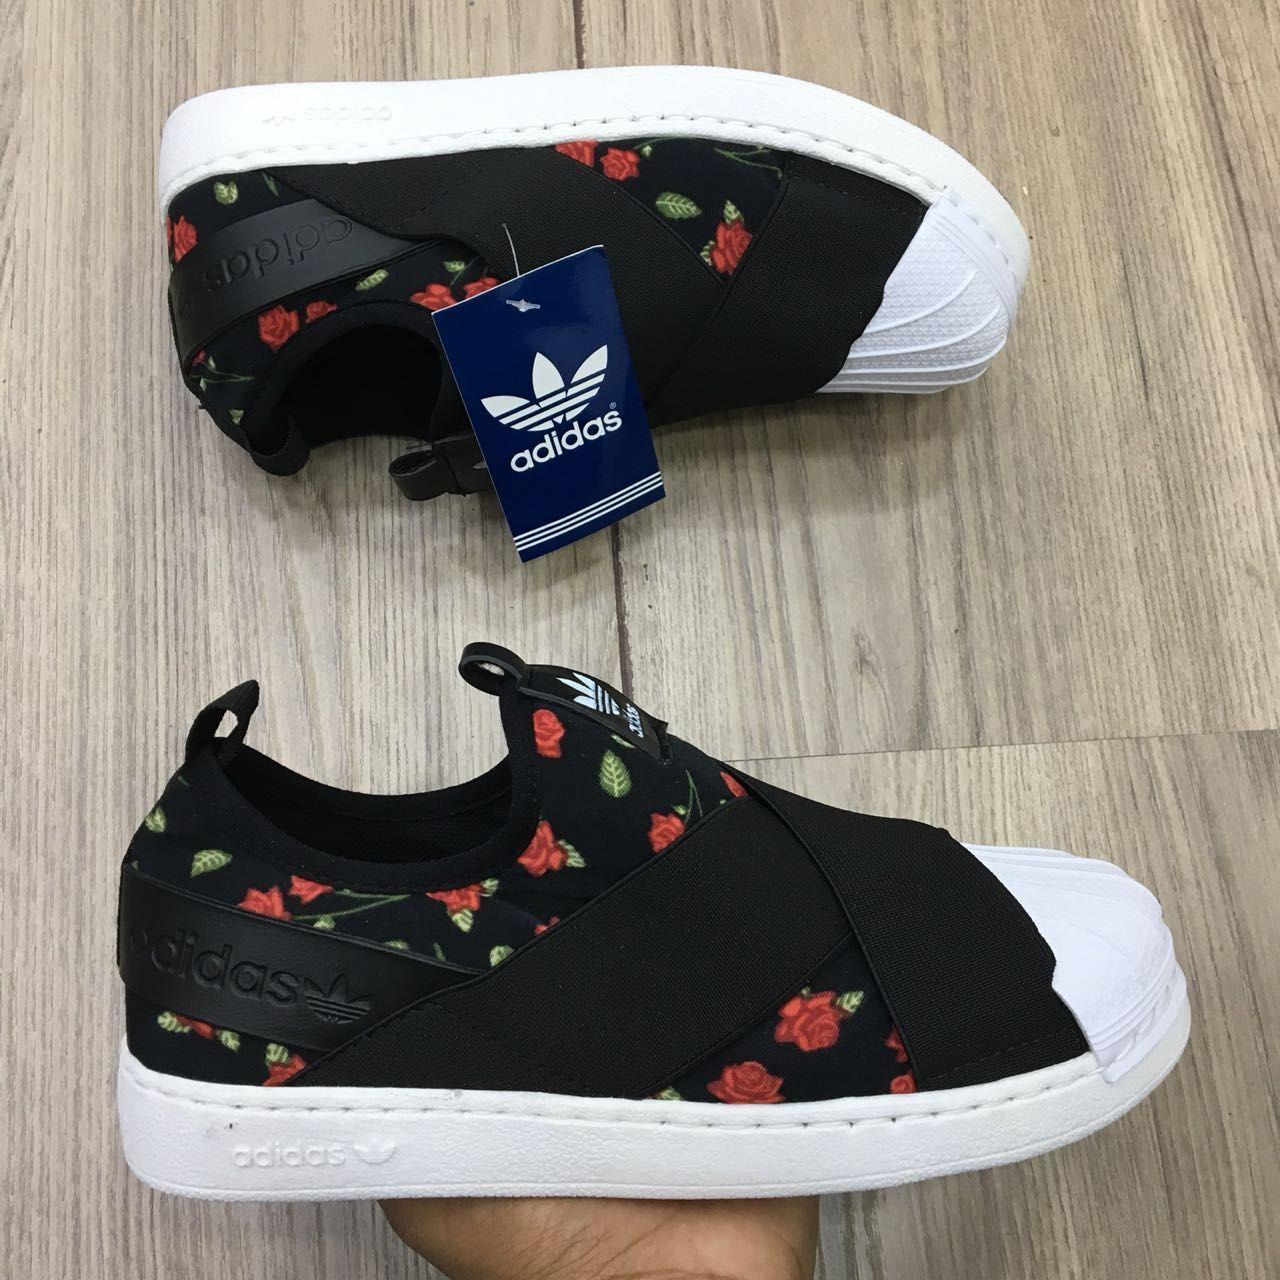 87a0fbe3da1 Adidas Superstar Slip On Florido ❤